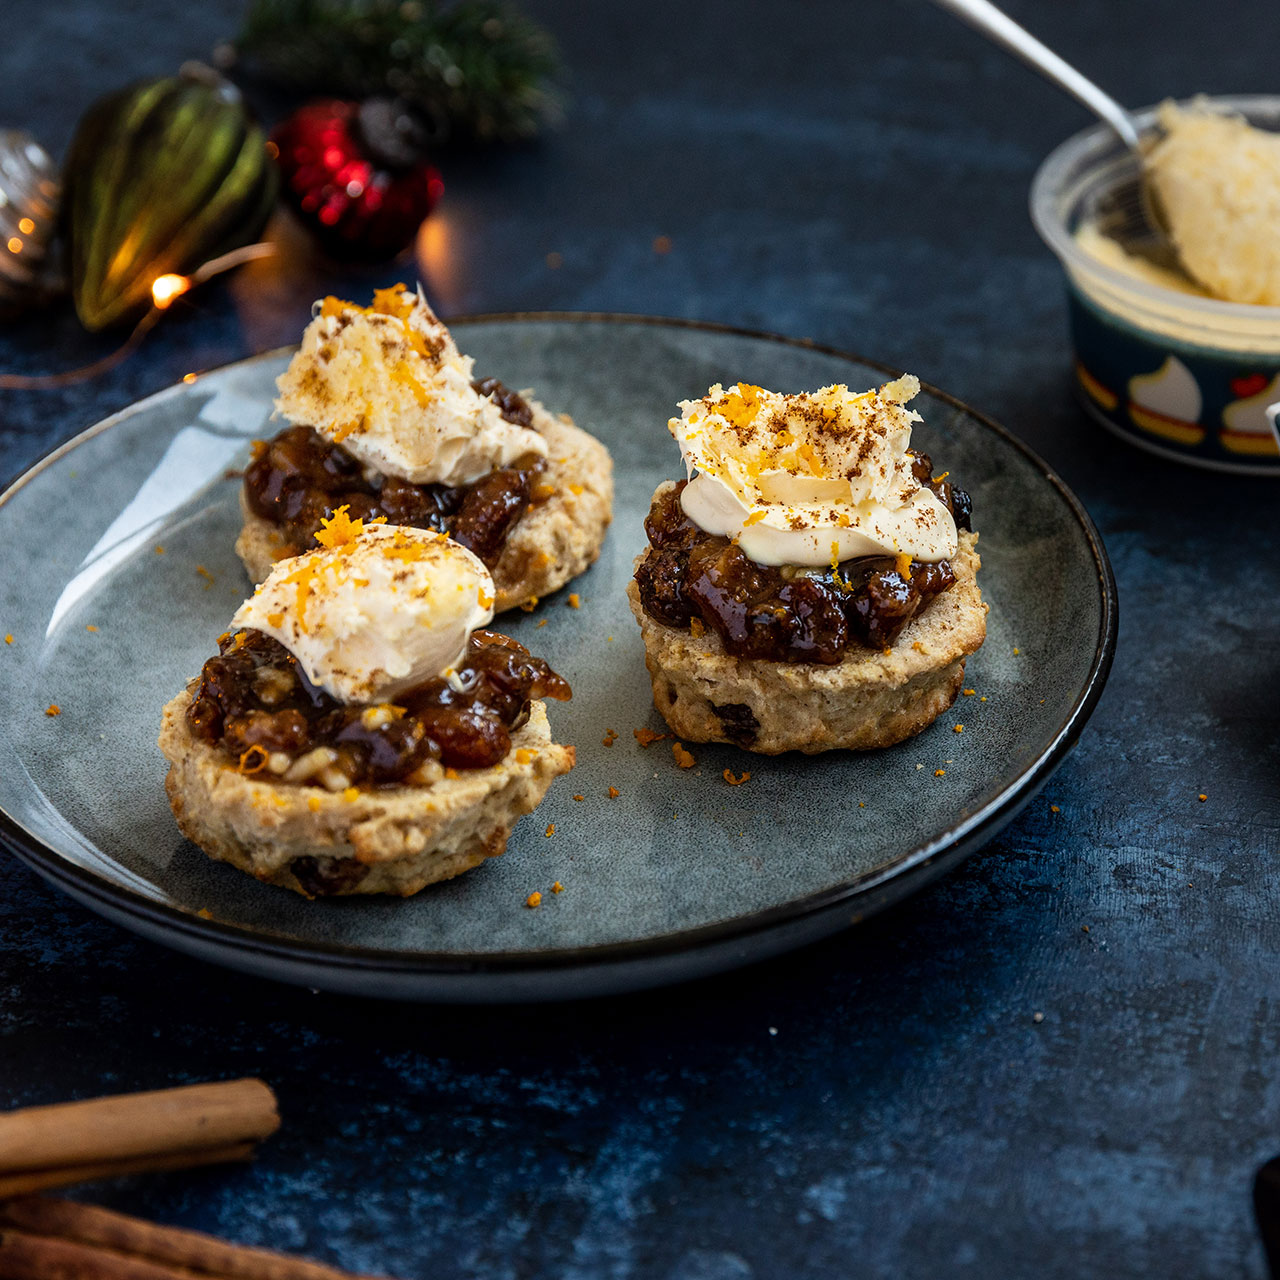 Christmas Cream Tea with Spiced Clotted Cream